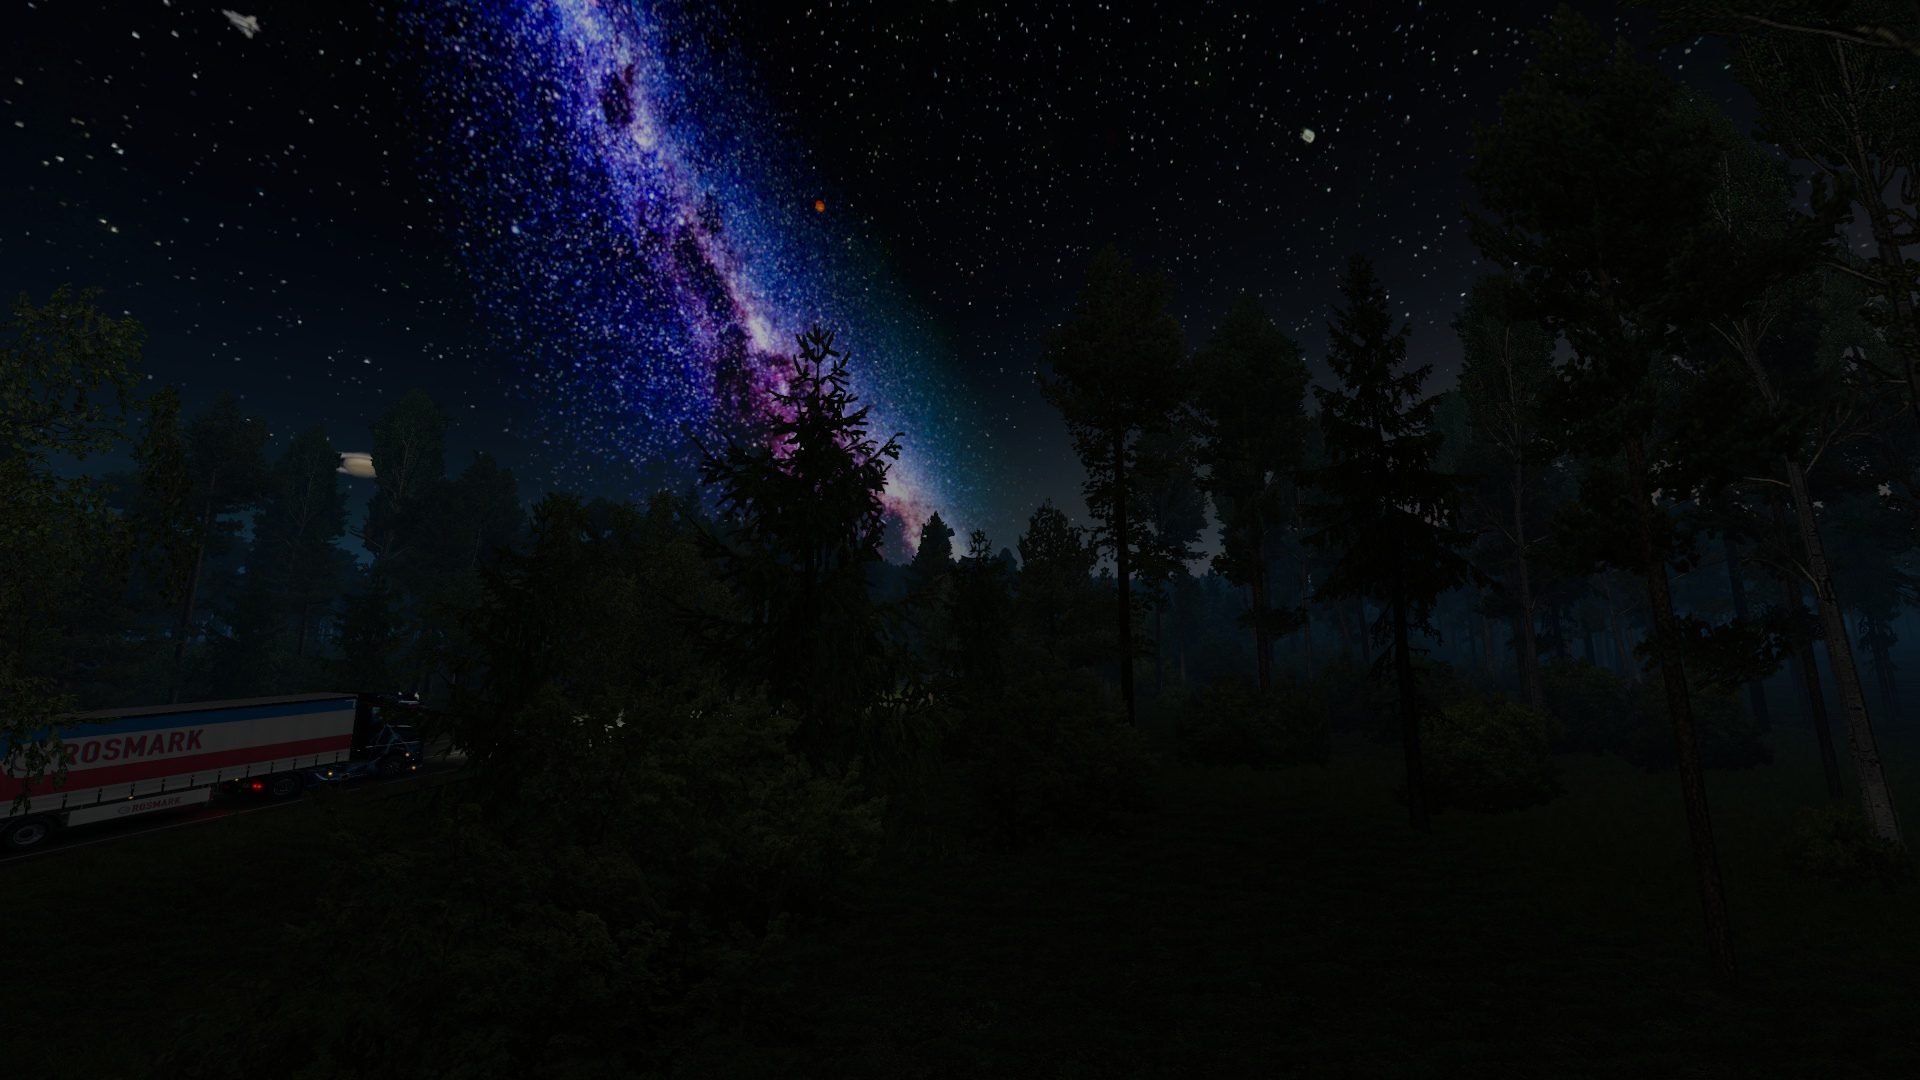 Image by ET2